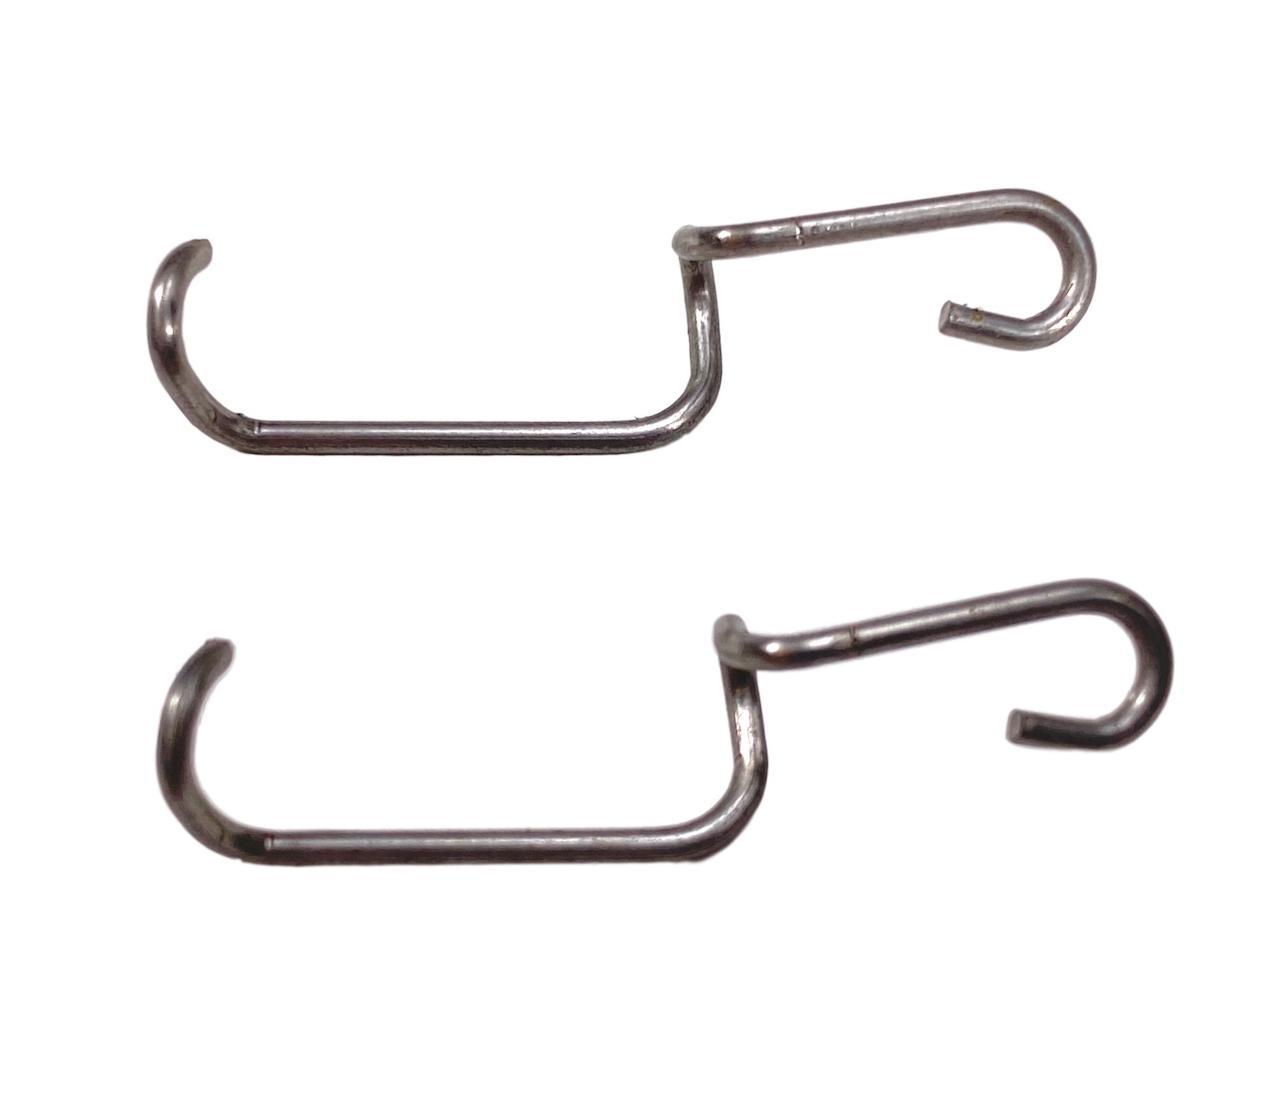 Chevy Door Lock Rod Clips Amp Wagon Tailgate